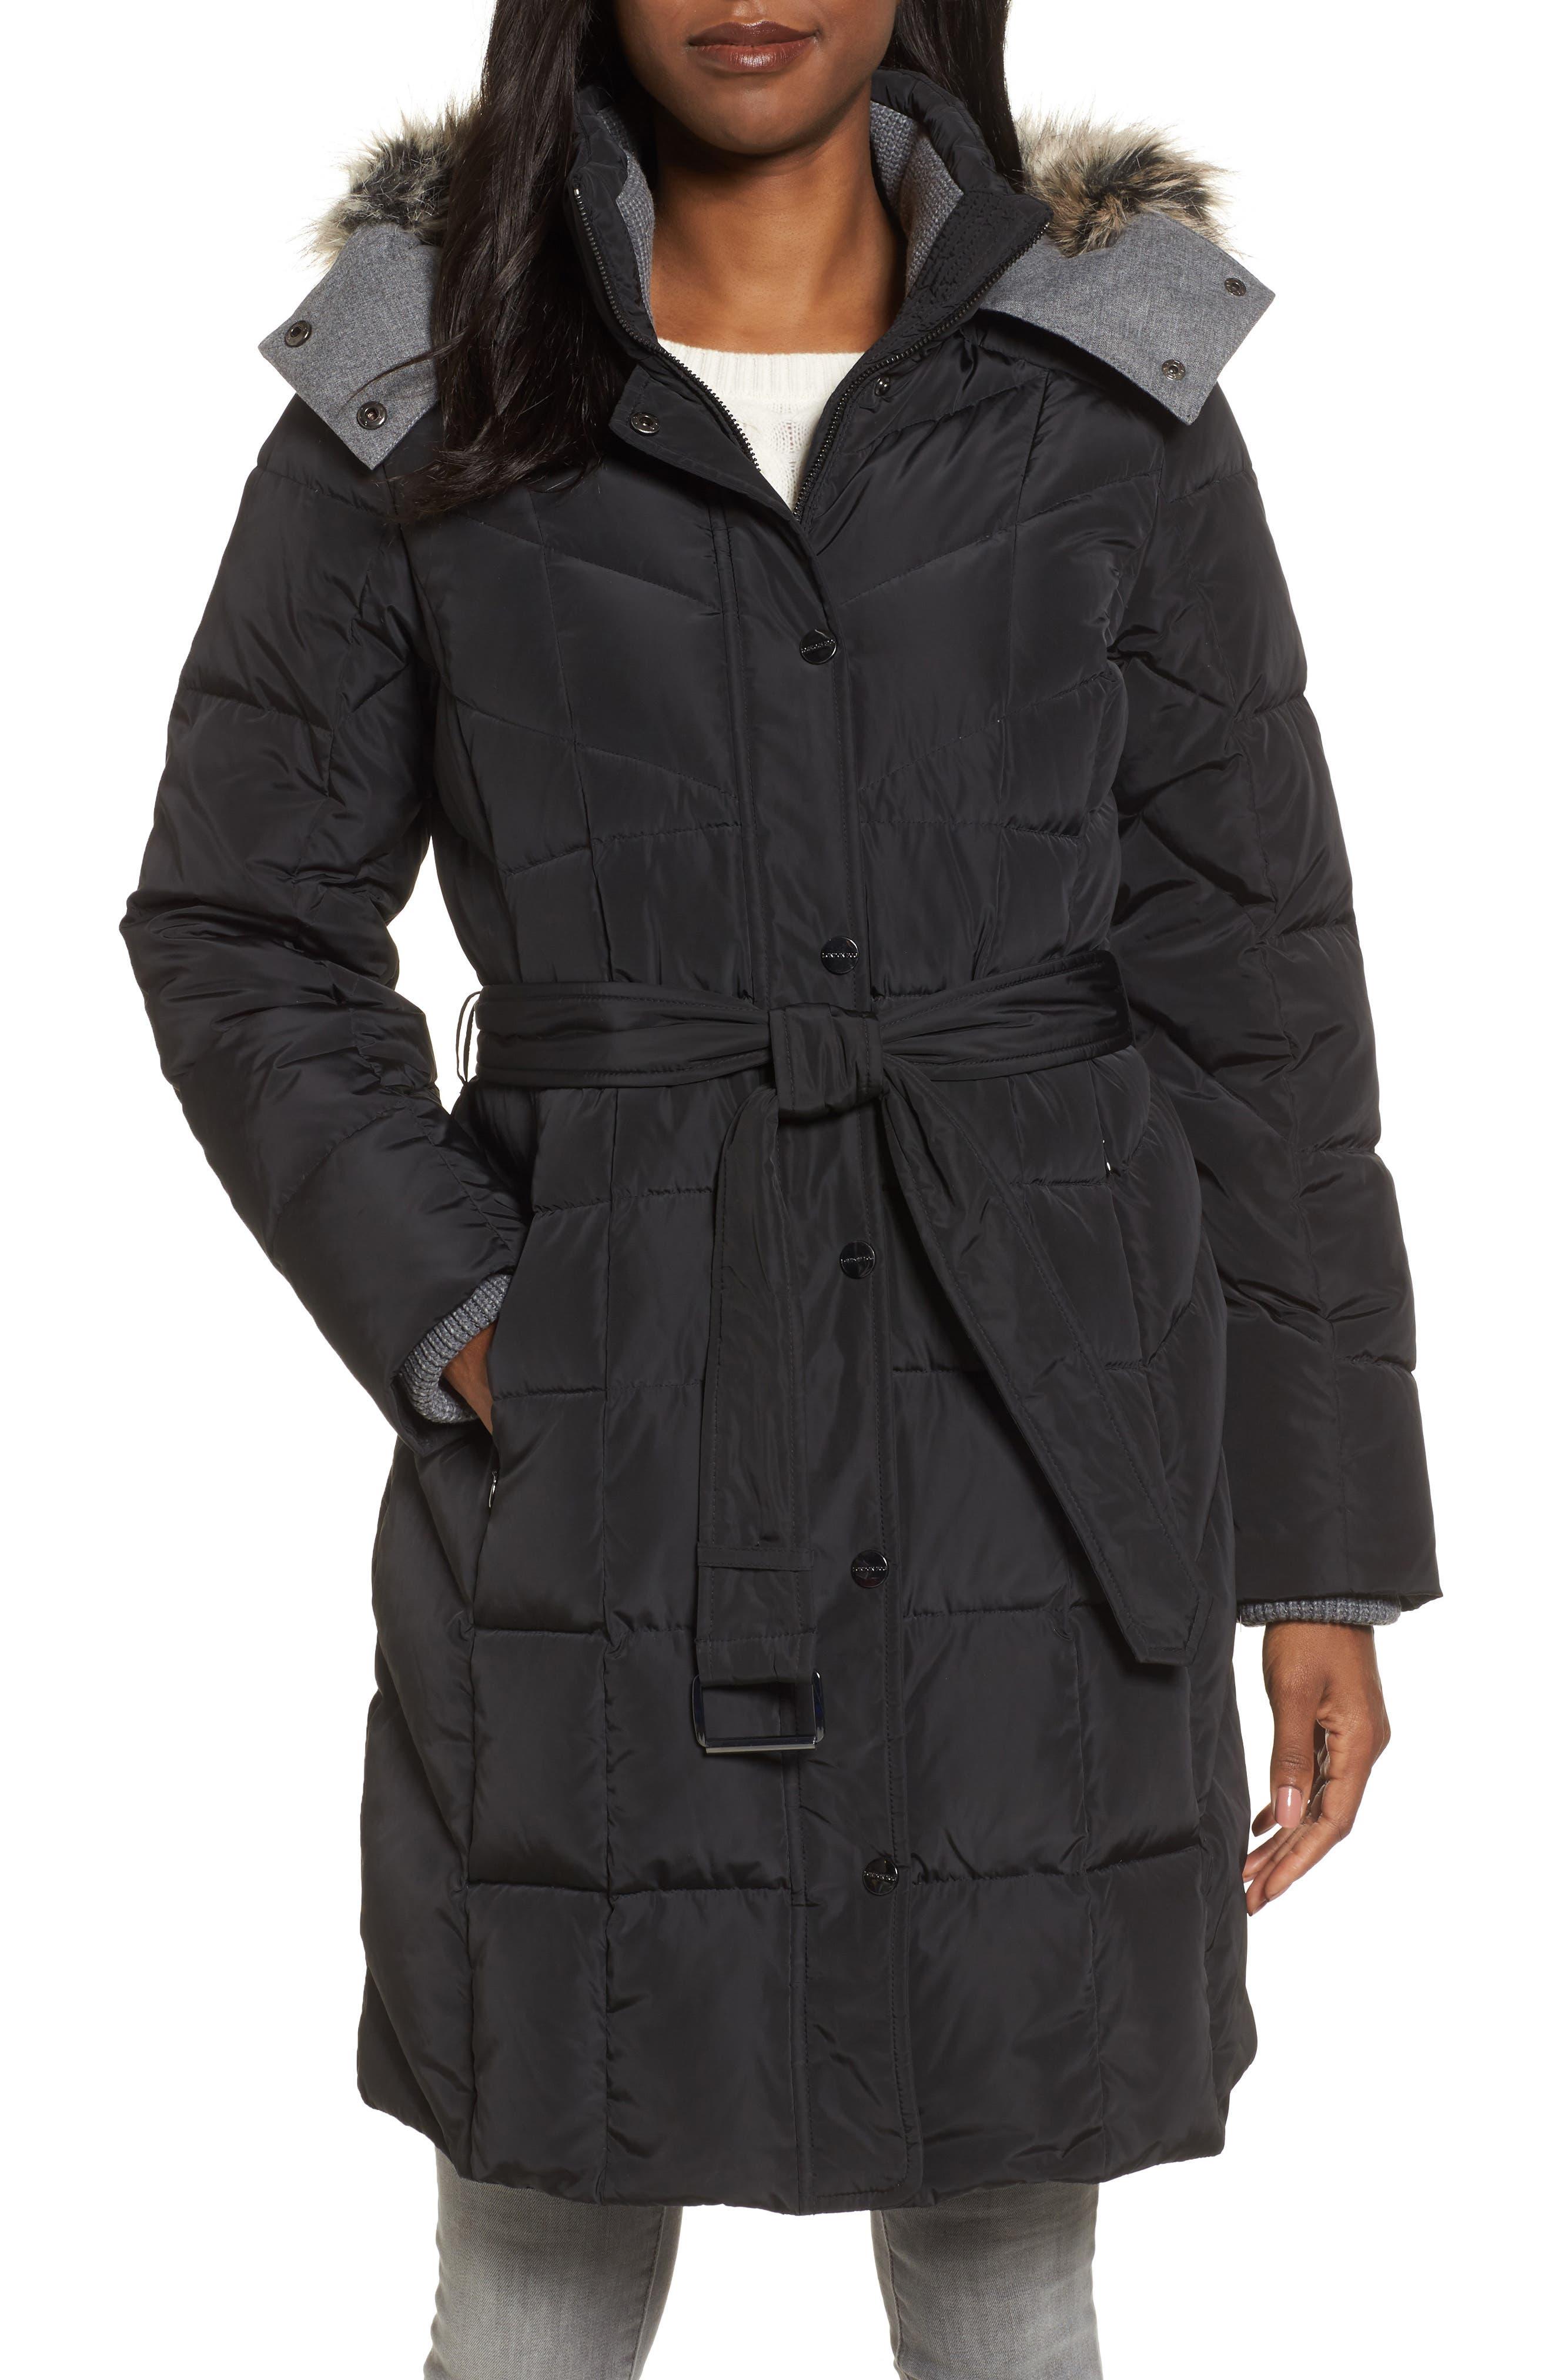 Main Image - London Fog Down Coat with Faux Fur Trim